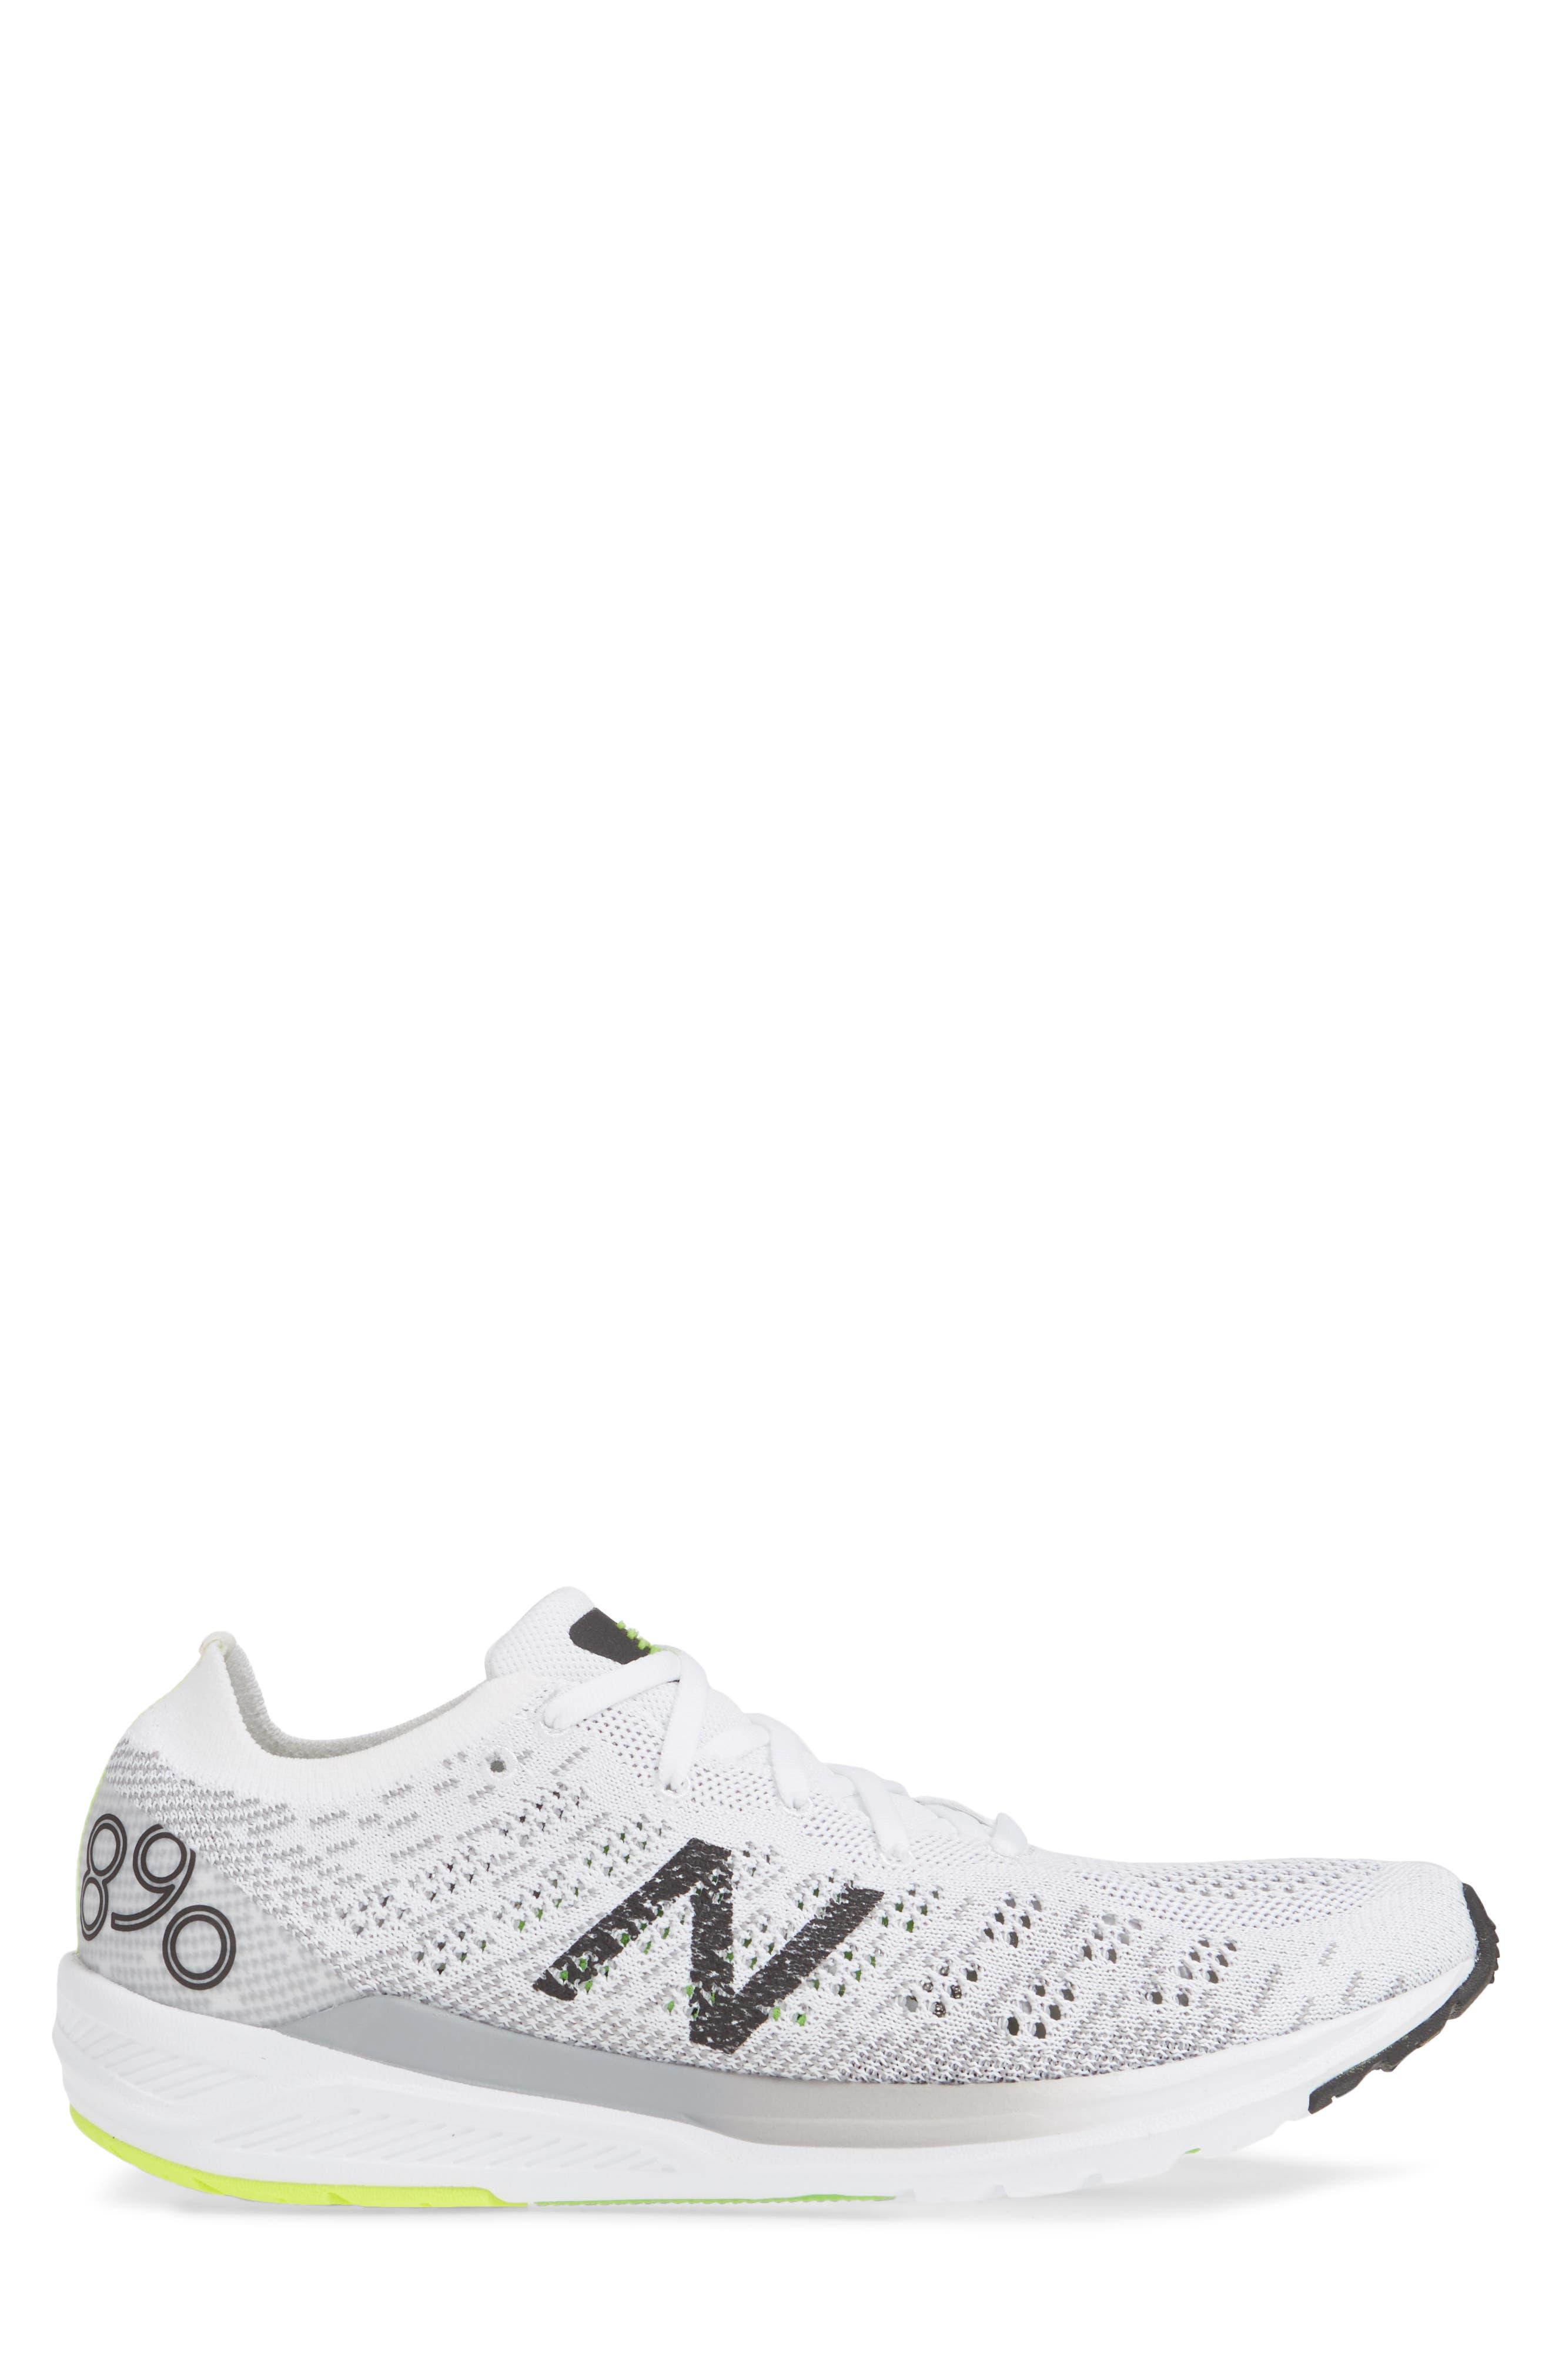 New Balance Shoes 890v7 Running Shoe